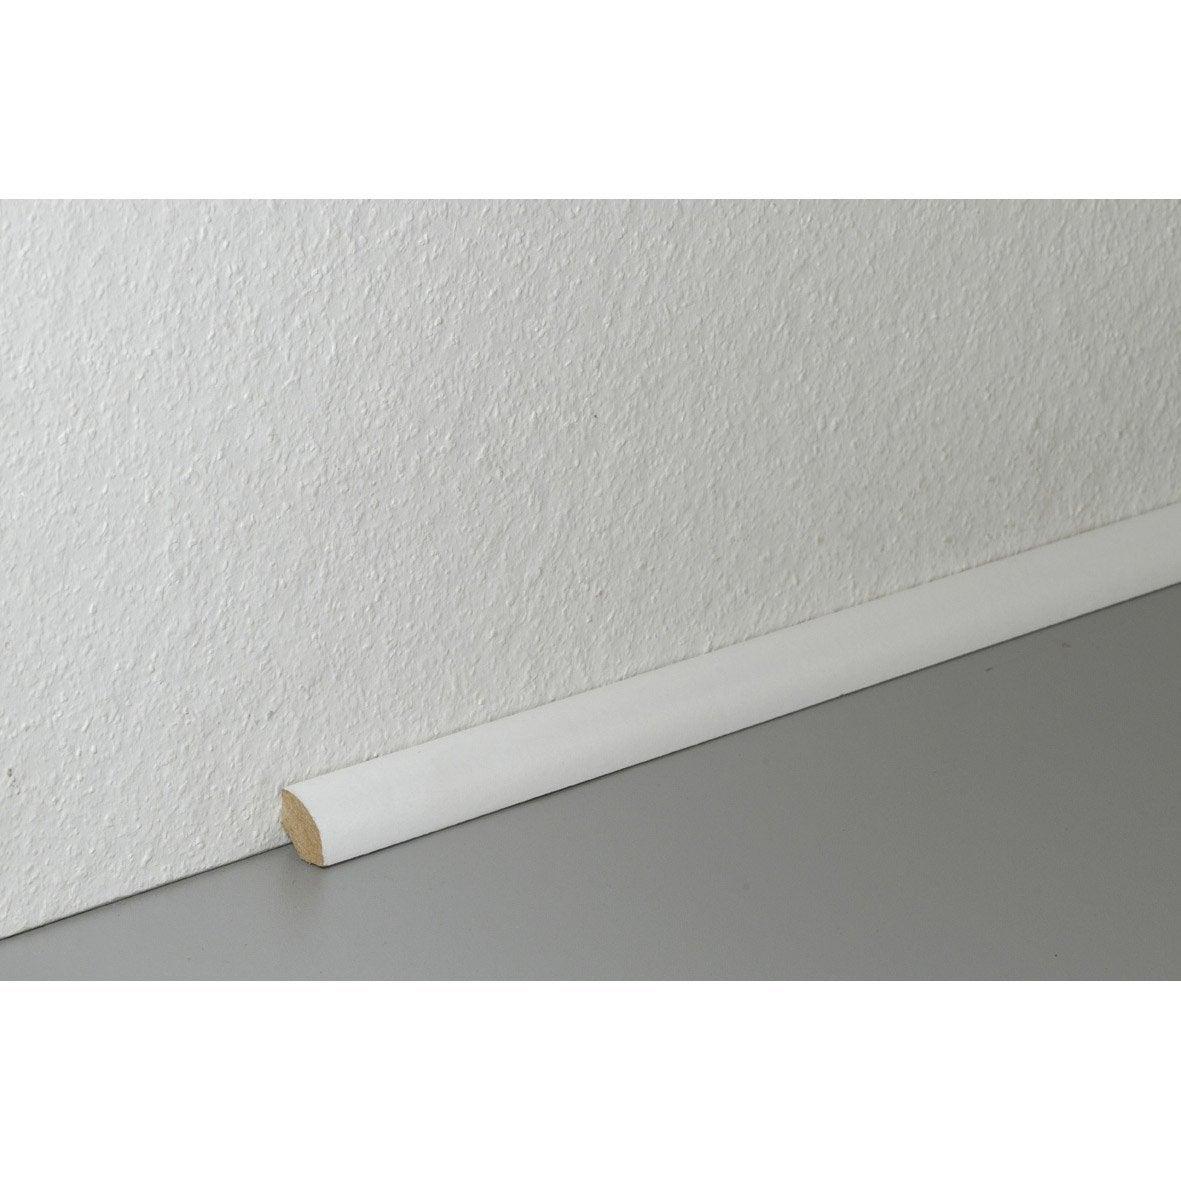 quart de rond sol stratifi blanc cm x x mm leroy merlin. Black Bedroom Furniture Sets. Home Design Ideas